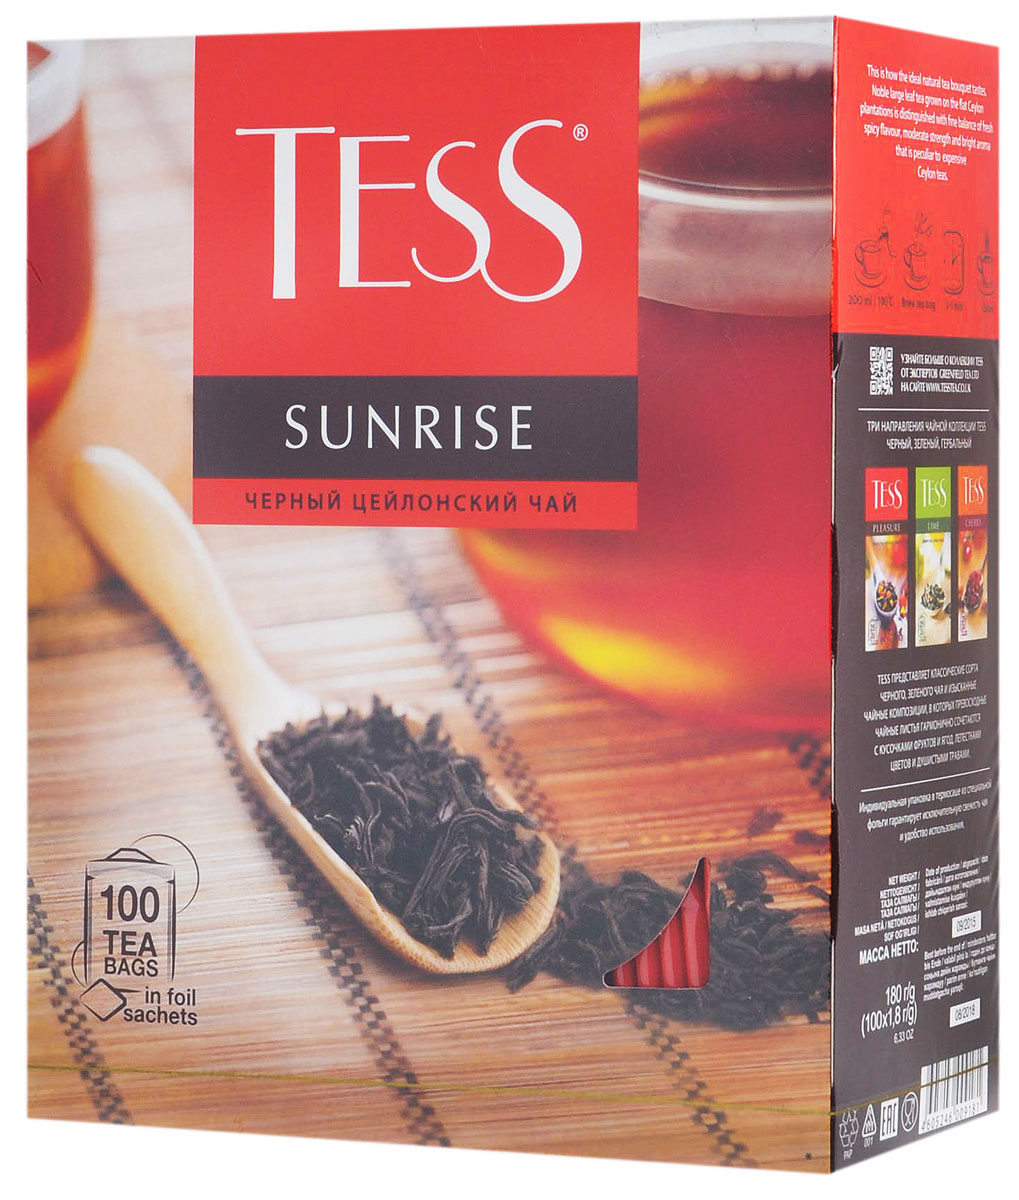 Tess Sunrise черный чай в пакетиках, 100 шт цена 2017